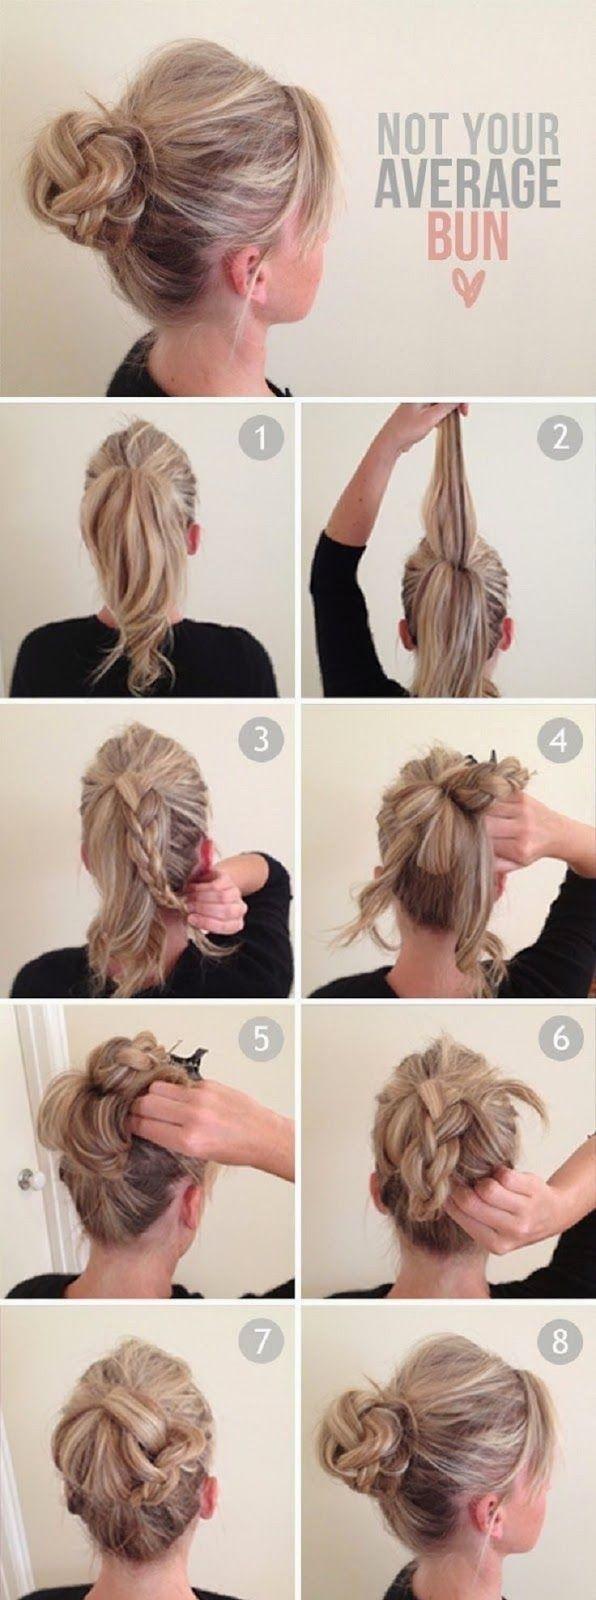 10 Ways to Make Cute Everyday Hairstyles: Long Hair Tutorials